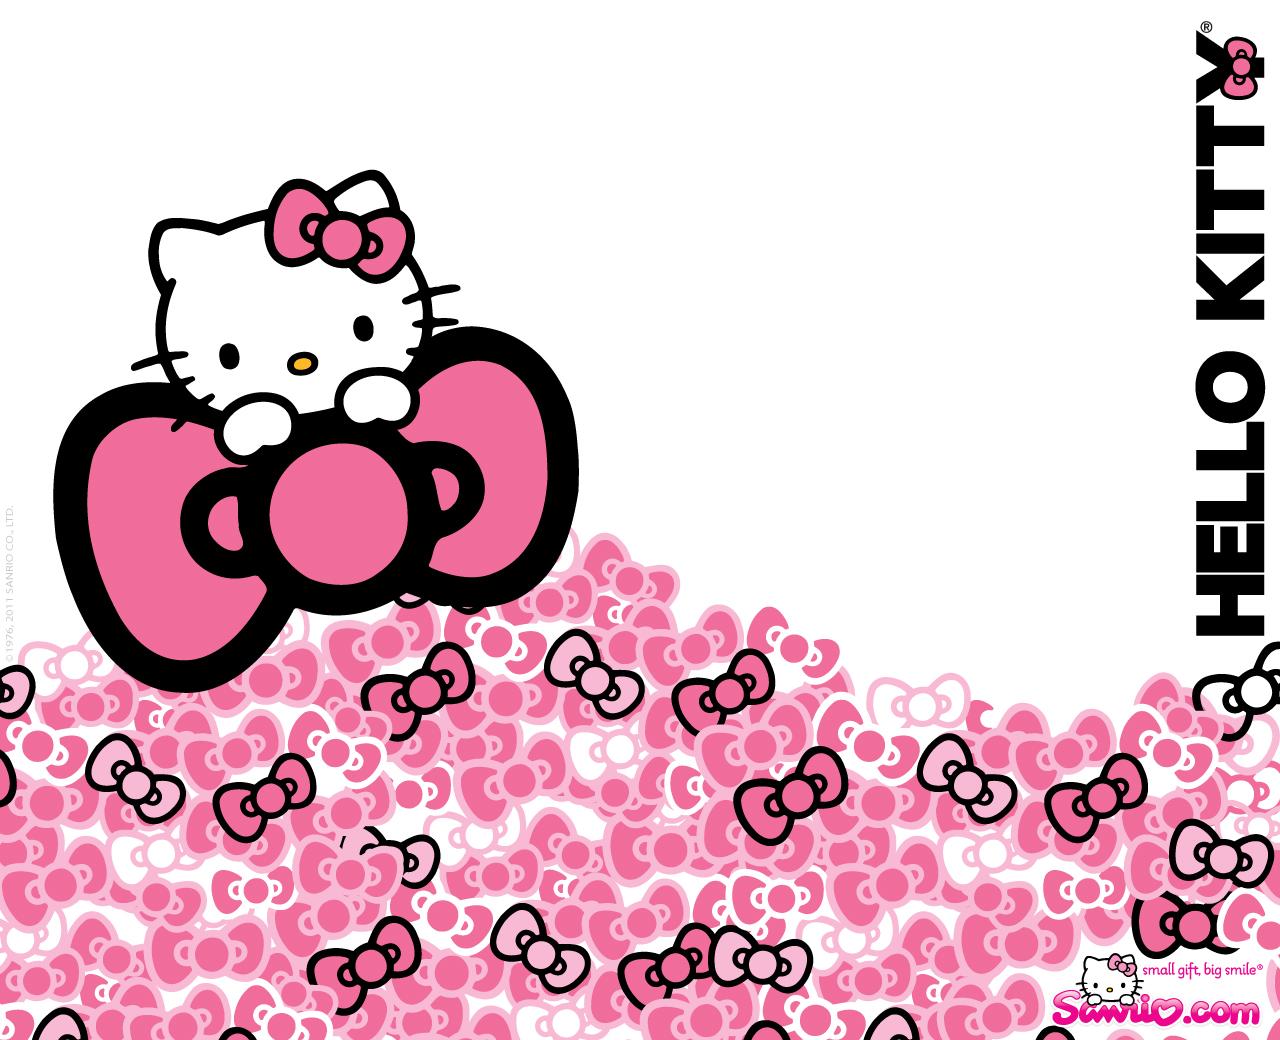 Namn:  Hello-kitty-Wallpapers-From-Sanrio-Website.jpg Visningar: 817 Storlek:  621.8 KB